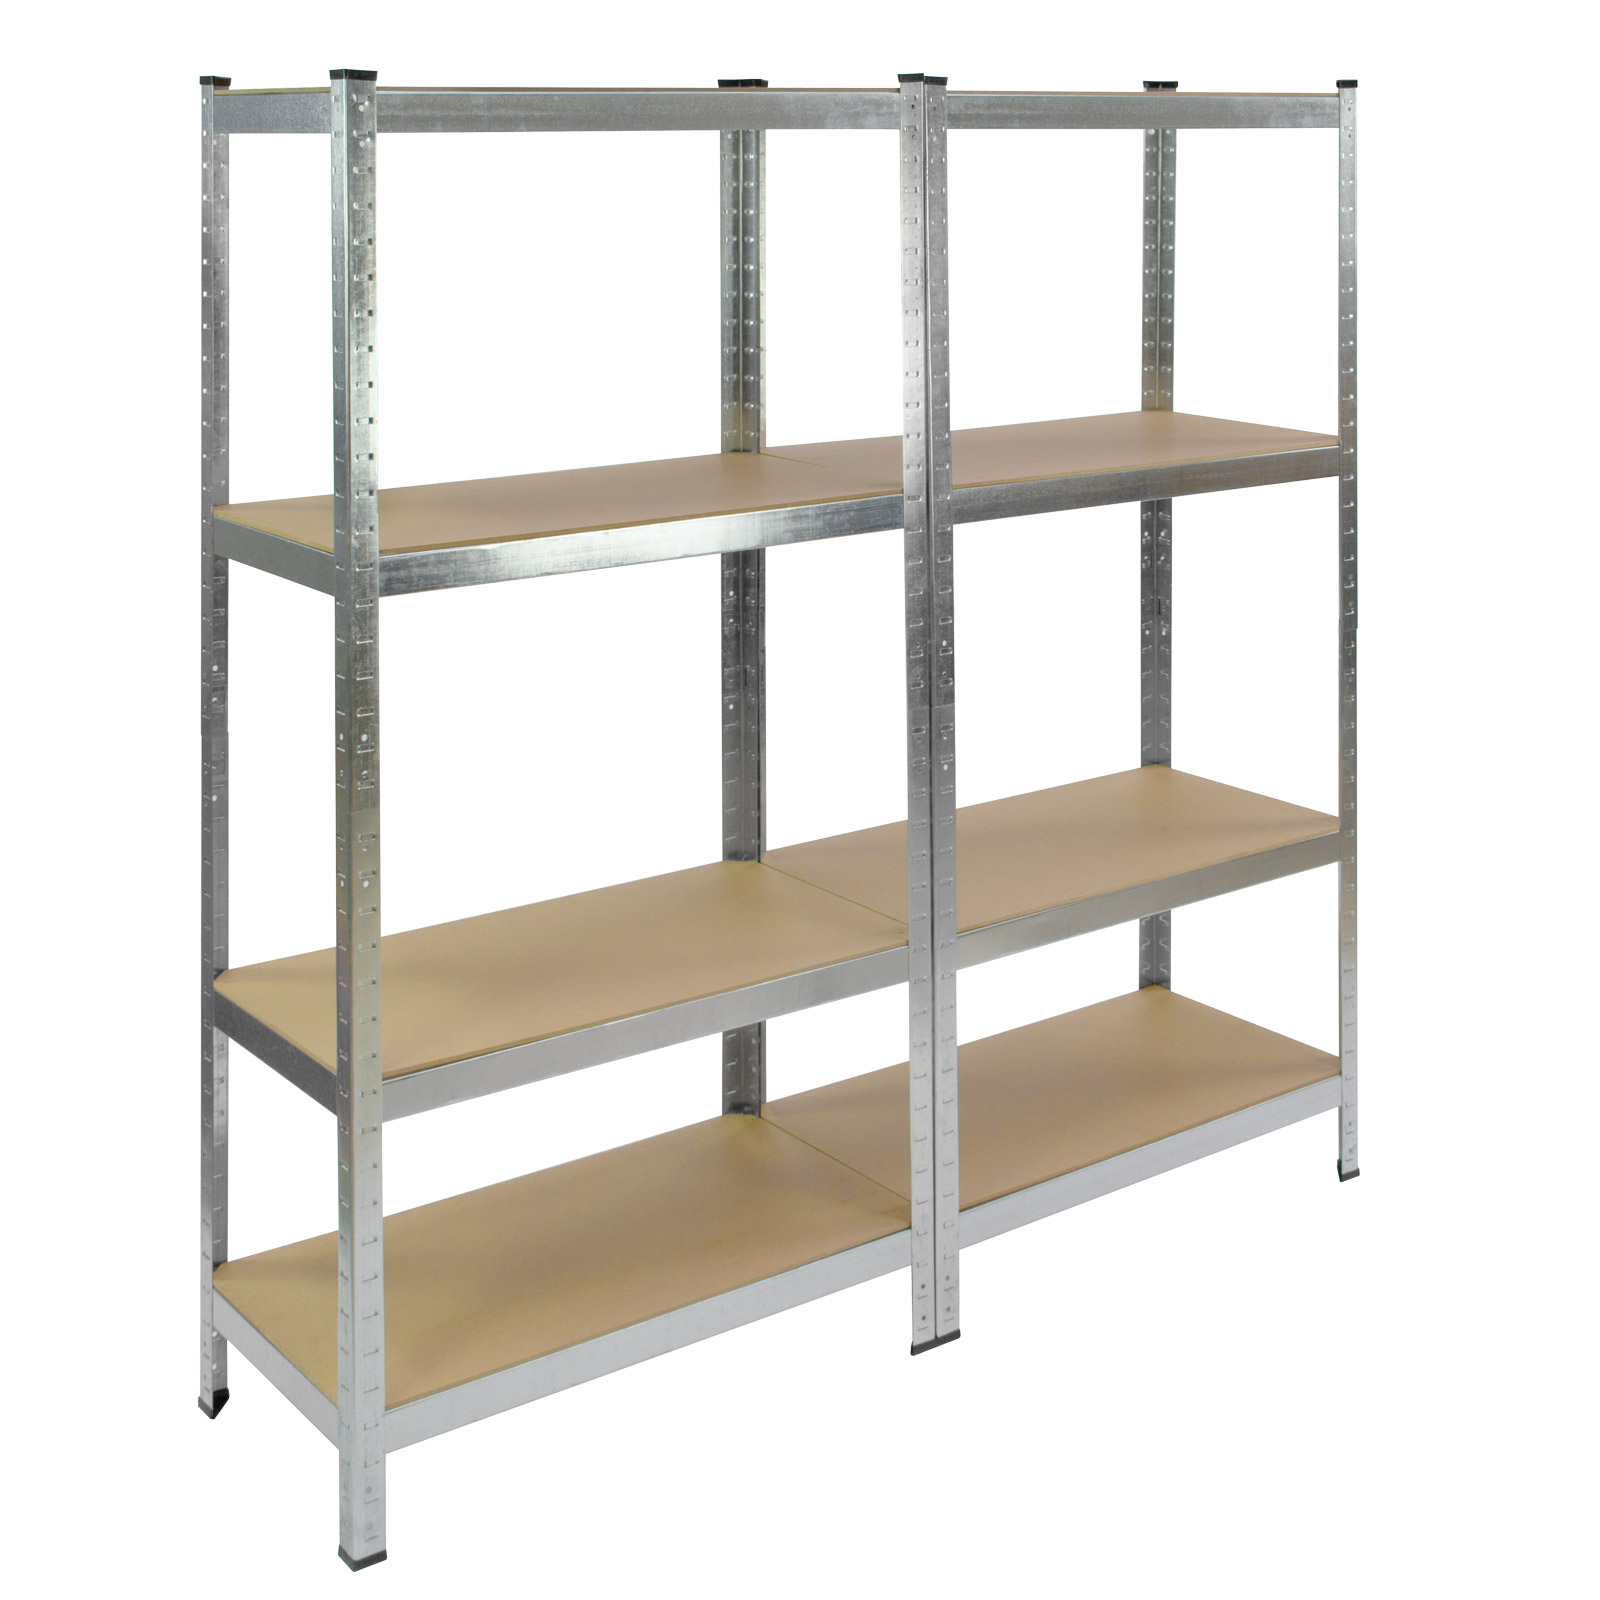 911089 steckregal kellerregal lagerregal metallregal schwerlastregal twin regal. Black Bedroom Furniture Sets. Home Design Ideas